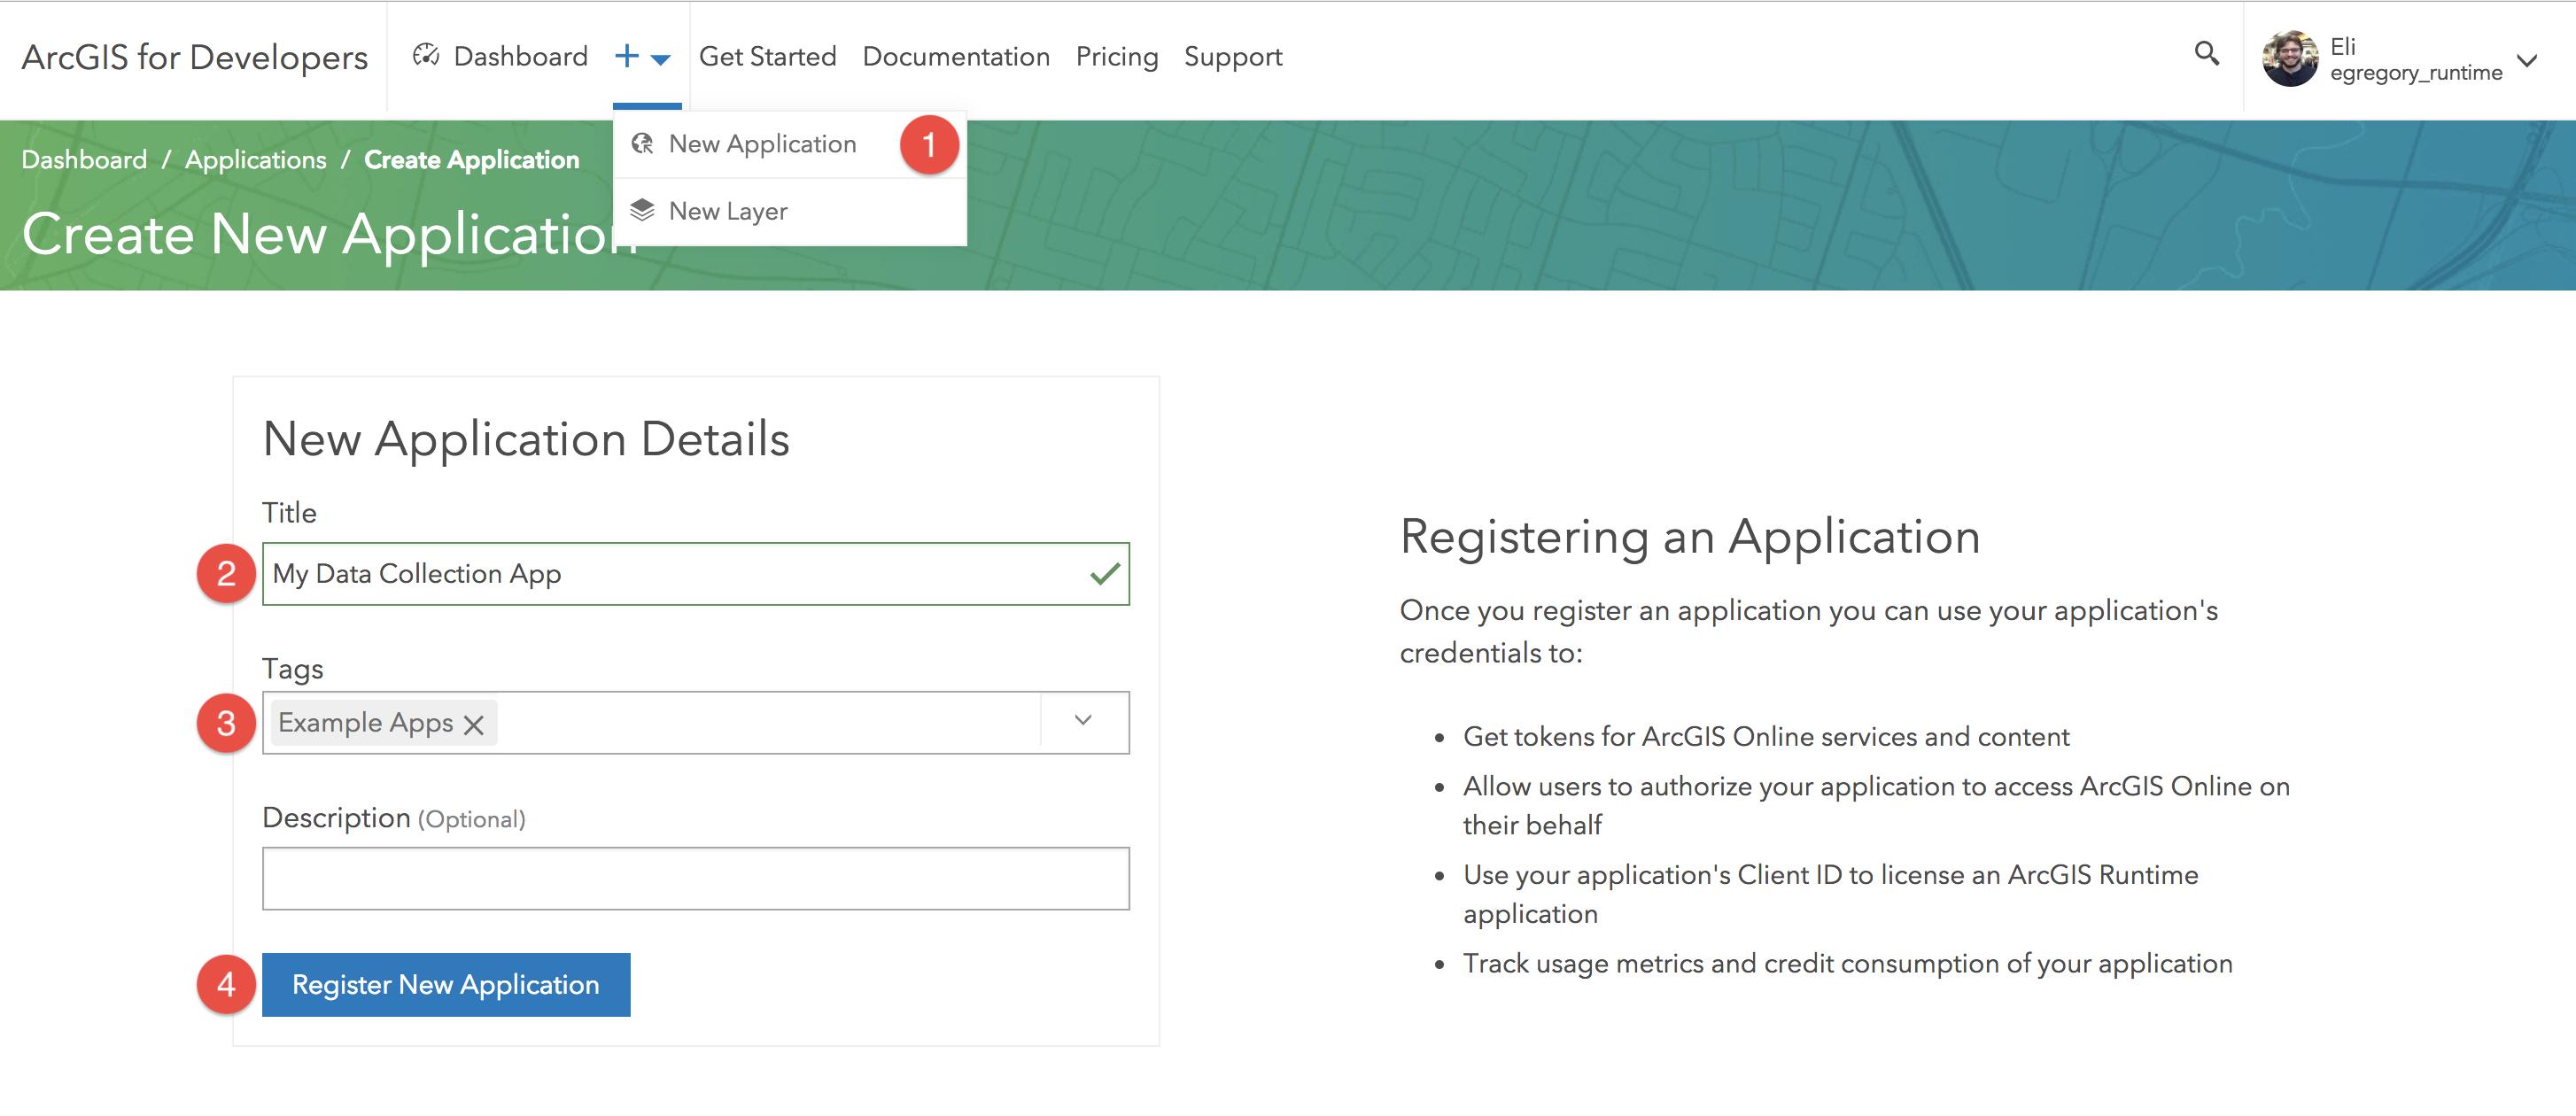 Register ArcGIS Application